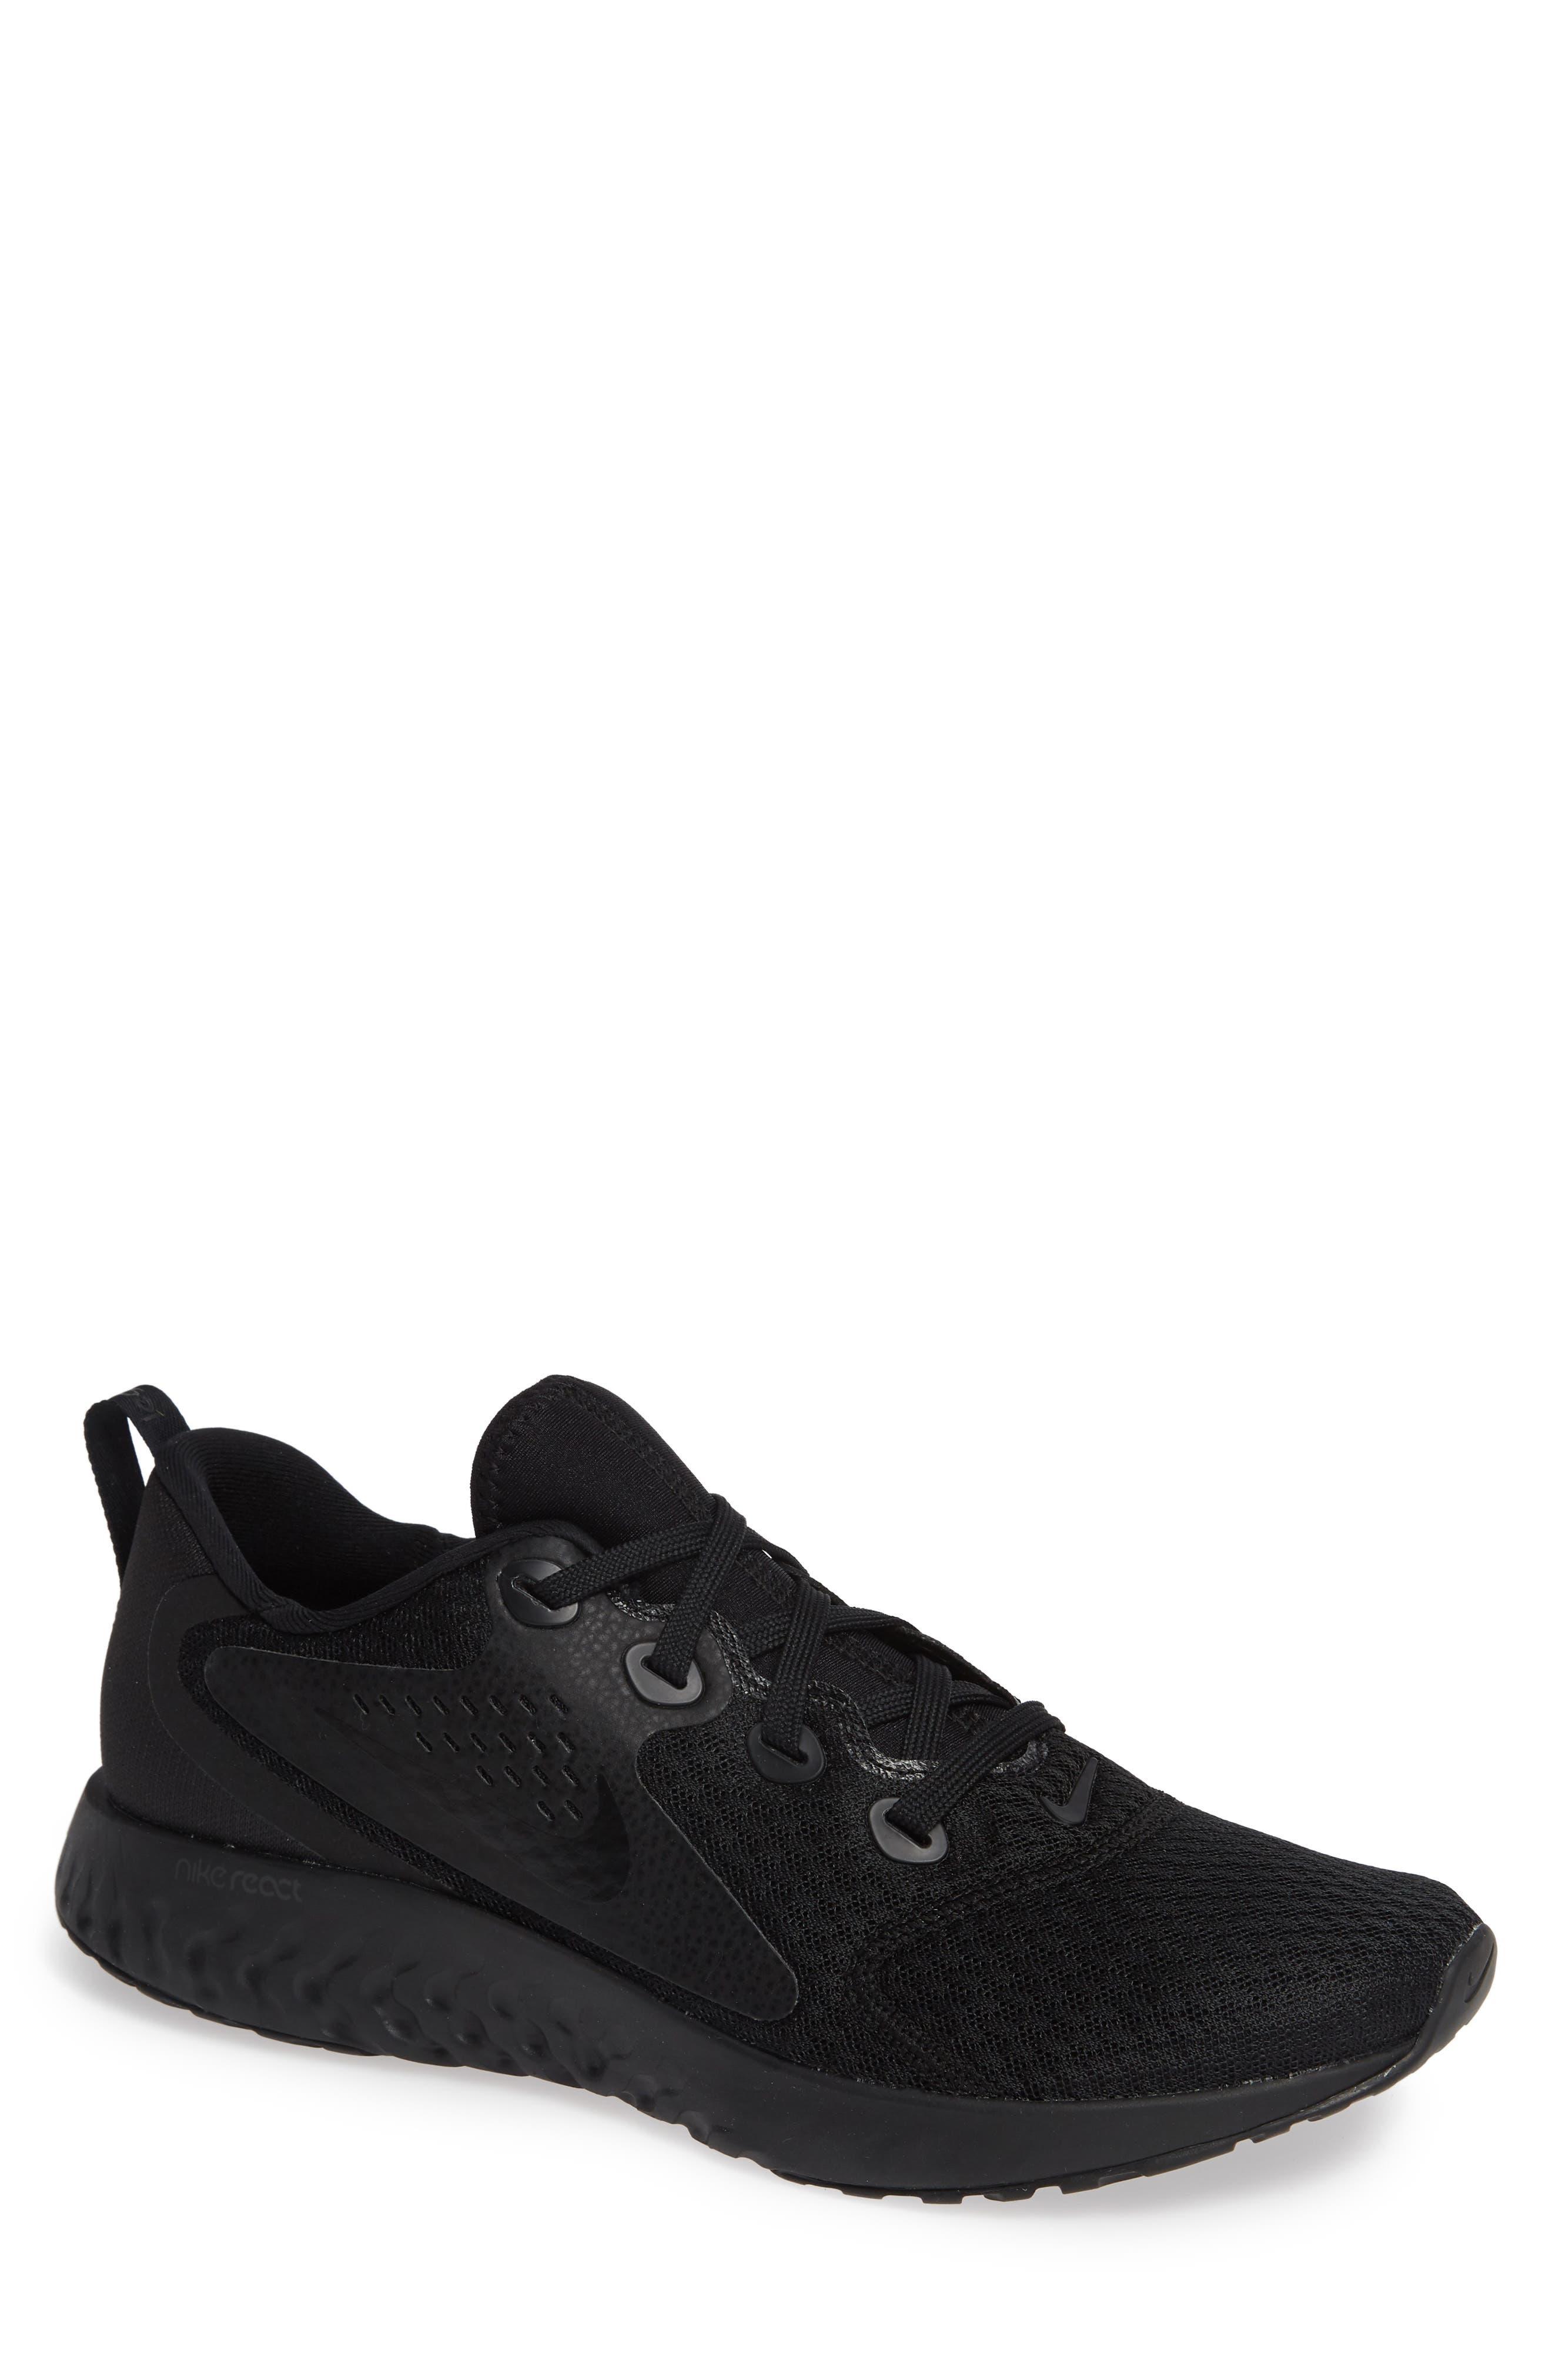 Rebel React Sneaker,                             Main thumbnail 1, color,                             BLACK/ BLACK